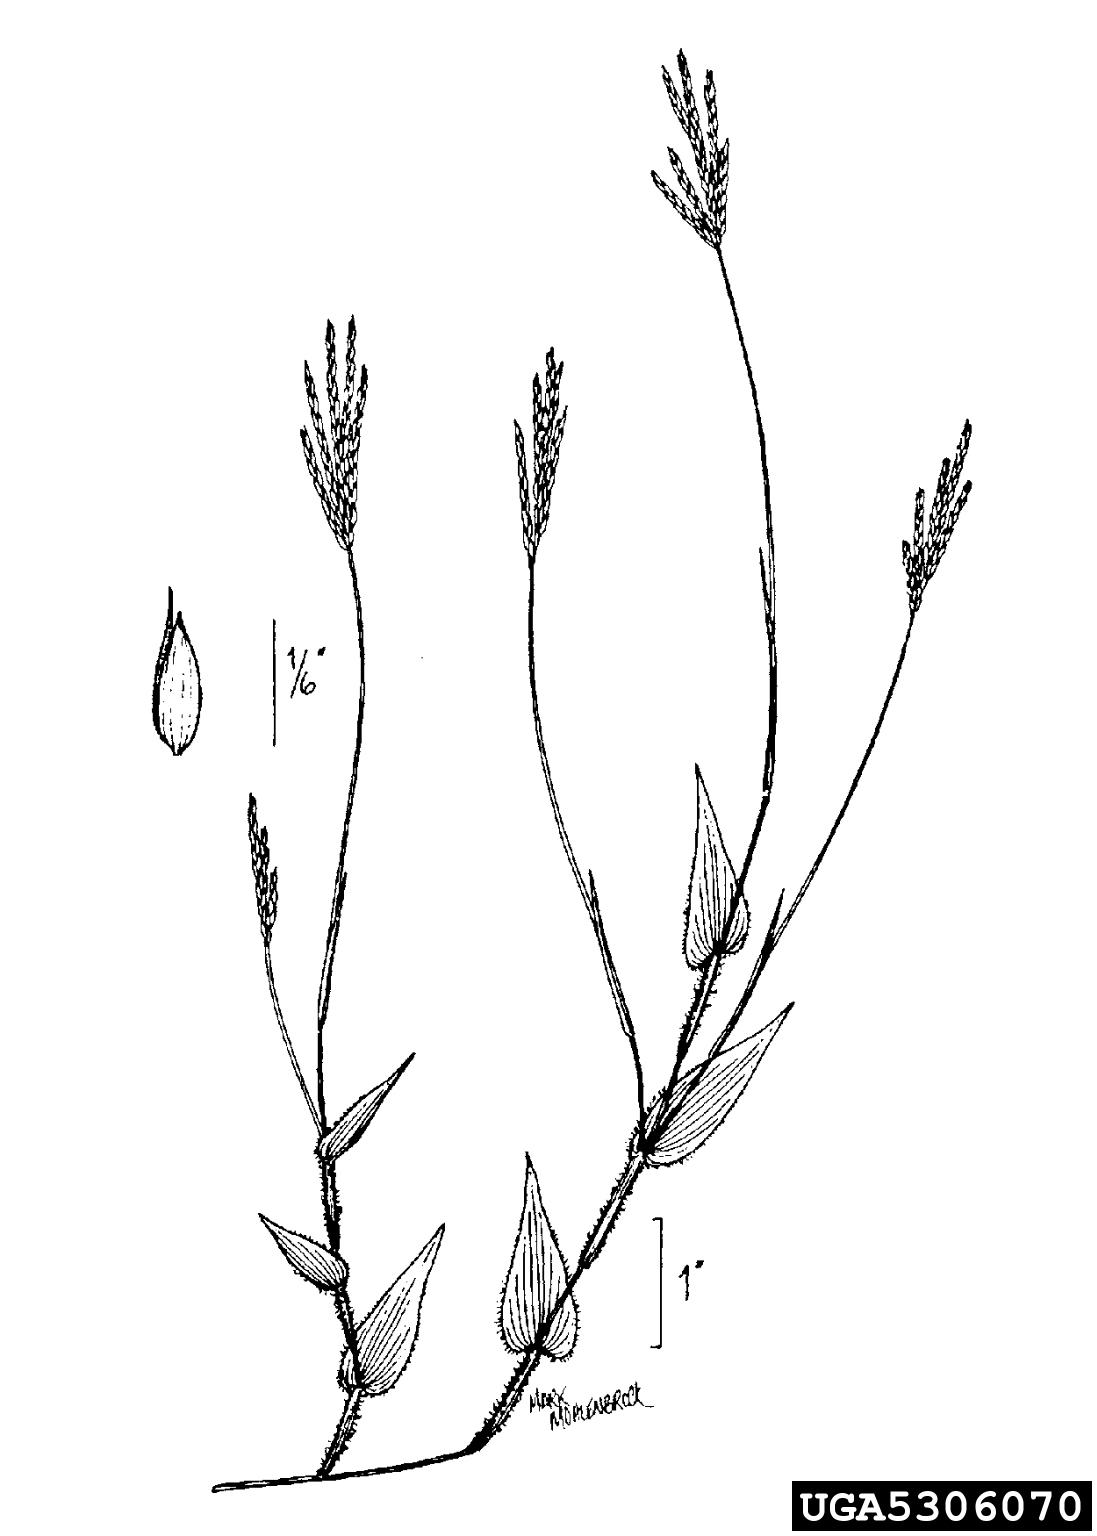 small carpgrass: Arthraxon hispidus (Cyperales: Poaceae)